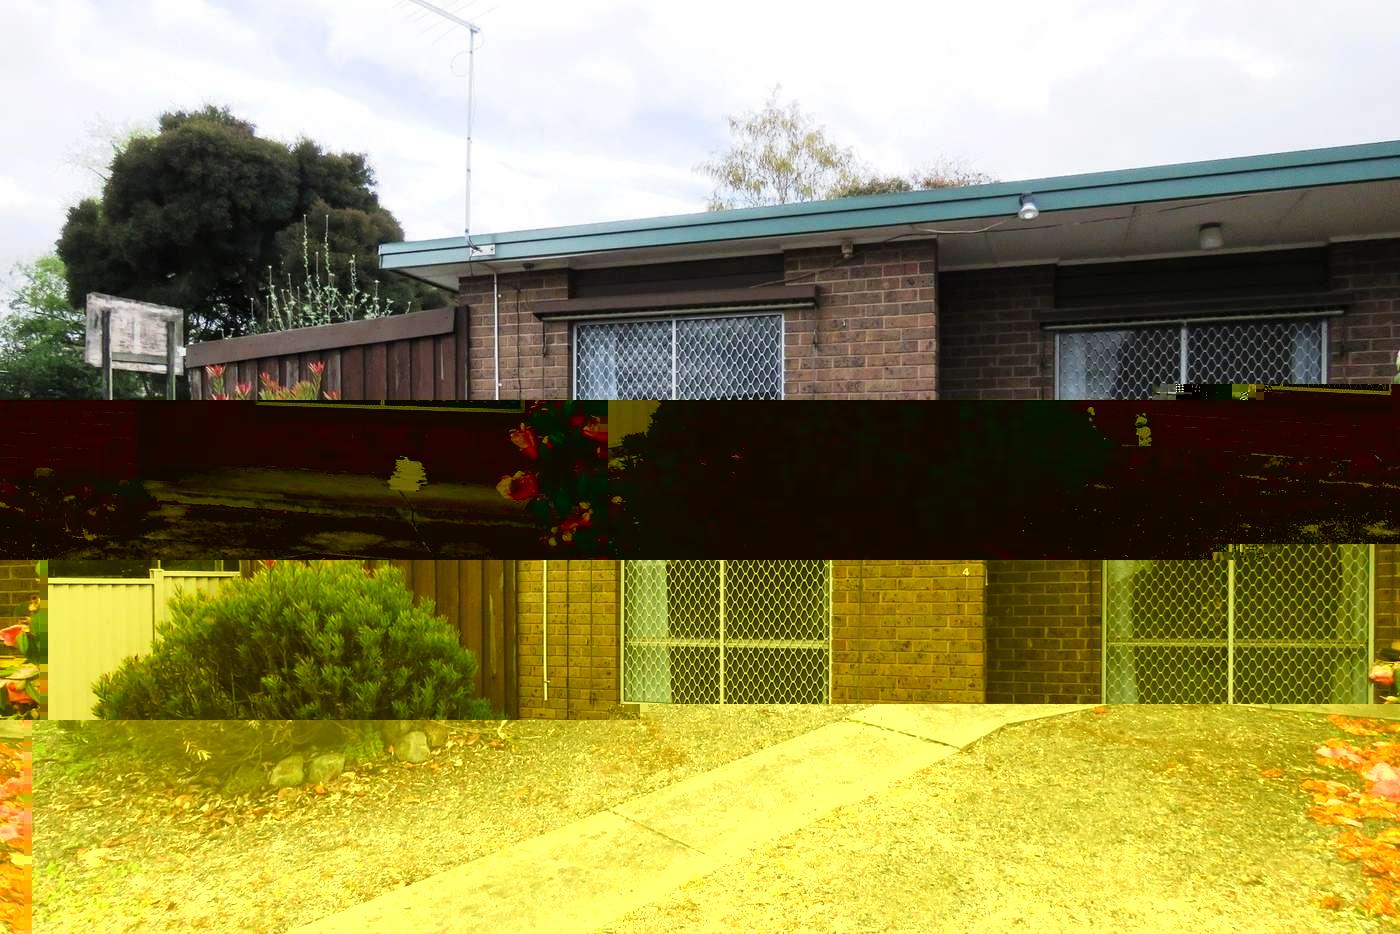 Main view of Homely unit listing, 4/1112 Havelock Street, Ballarat North VIC 3350